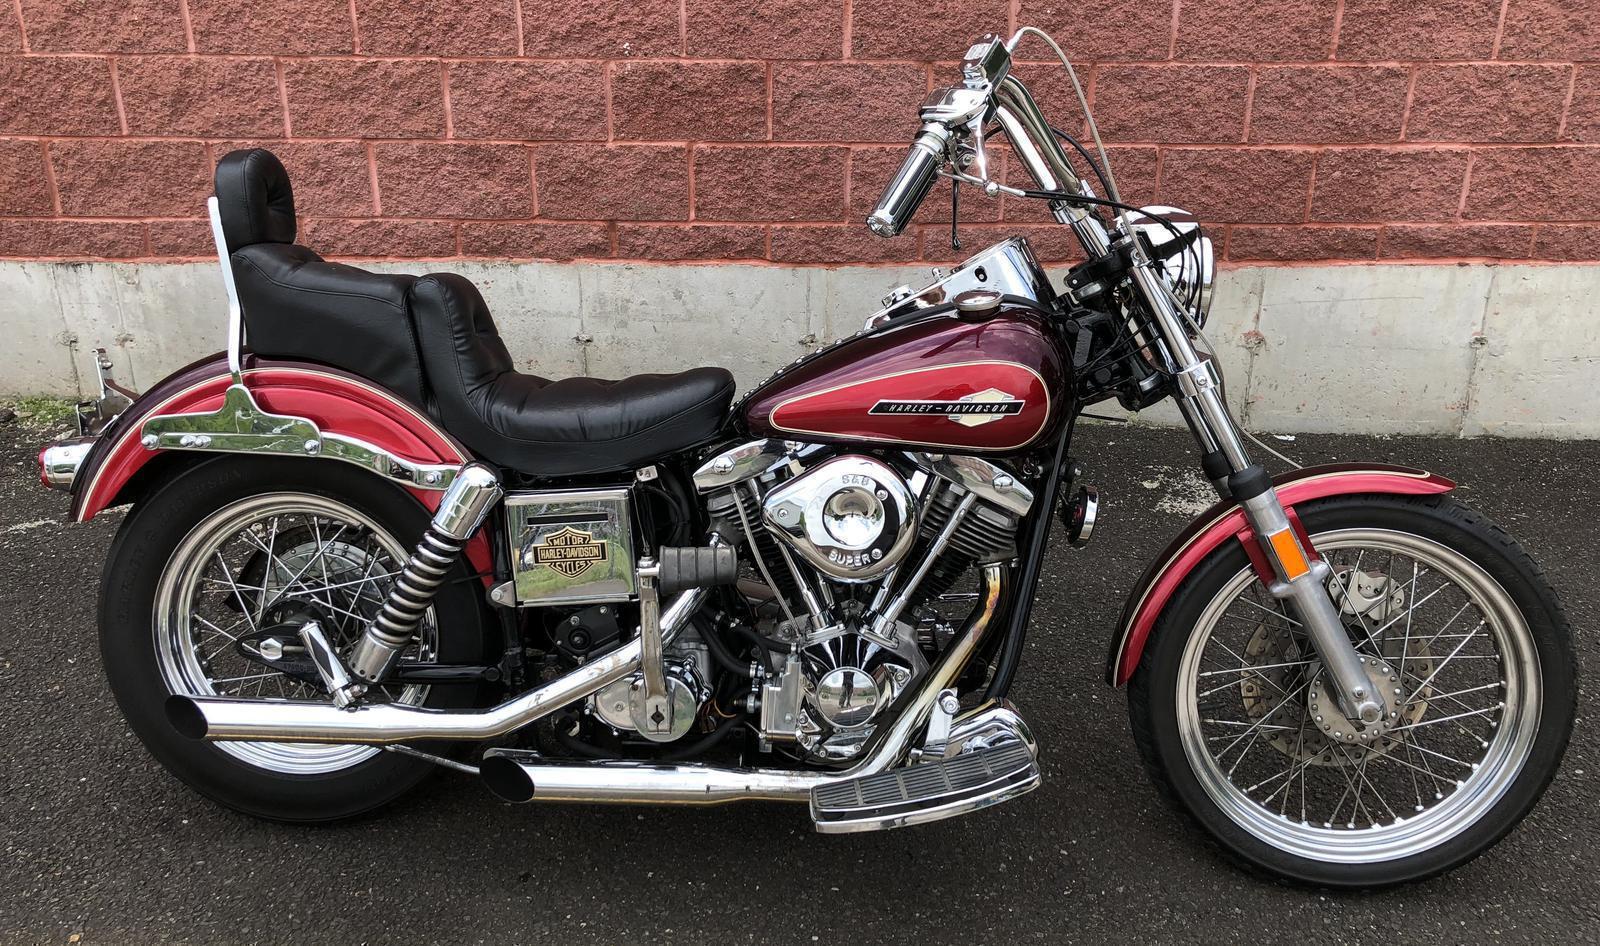 Inventory Doc's Motorcycle Parts Waterbury, CT (203) 757-0295